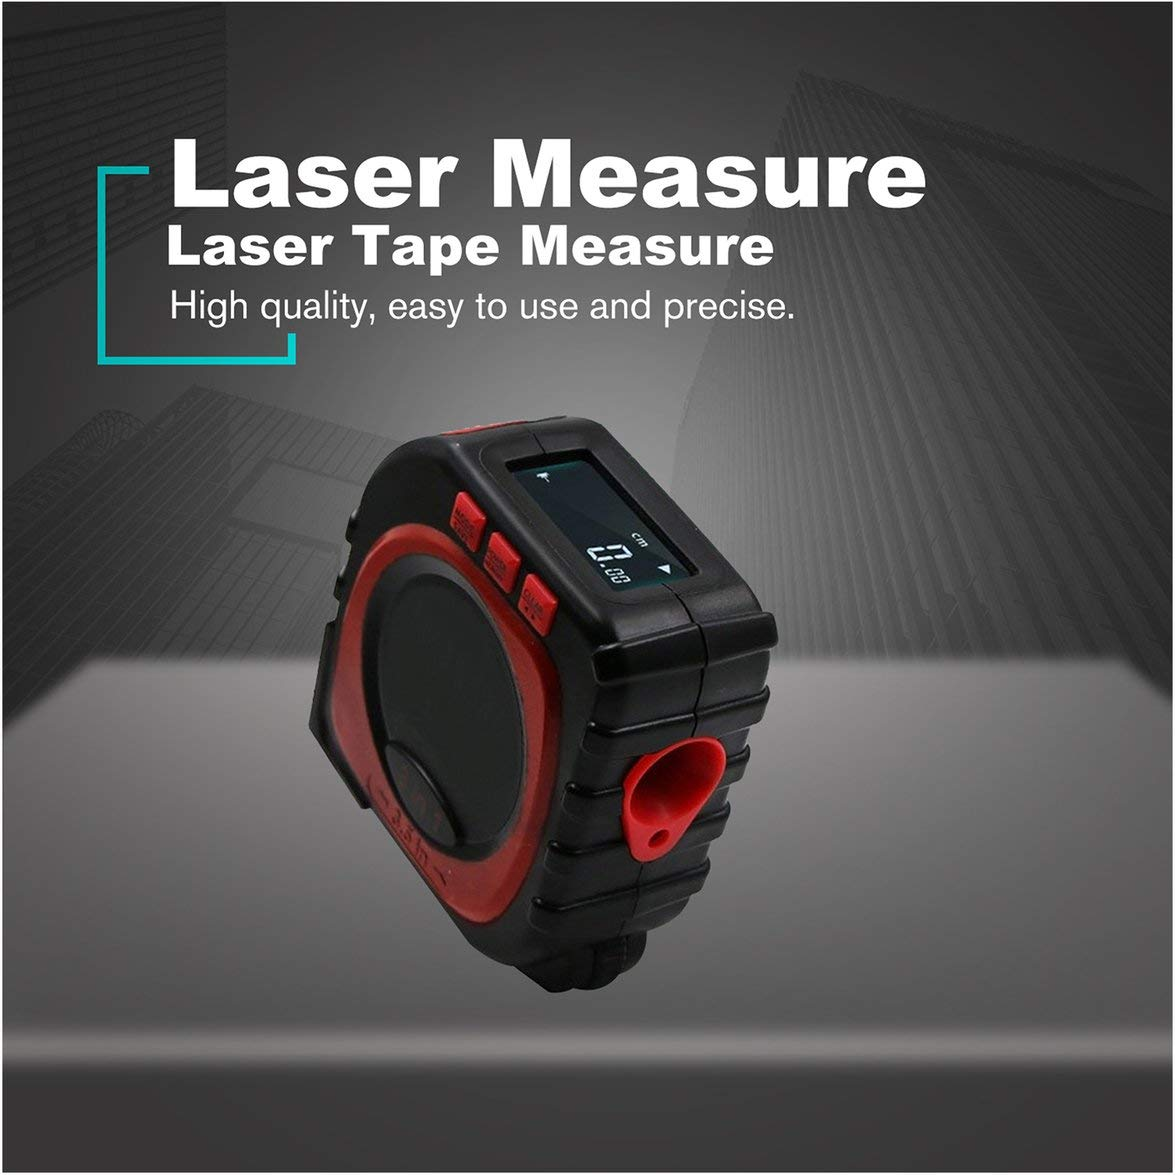 Banbie 3-in-1-Digitalma/ßband-Laser-Entfernungsmesser-Entfernungsmesser-Messger/ät